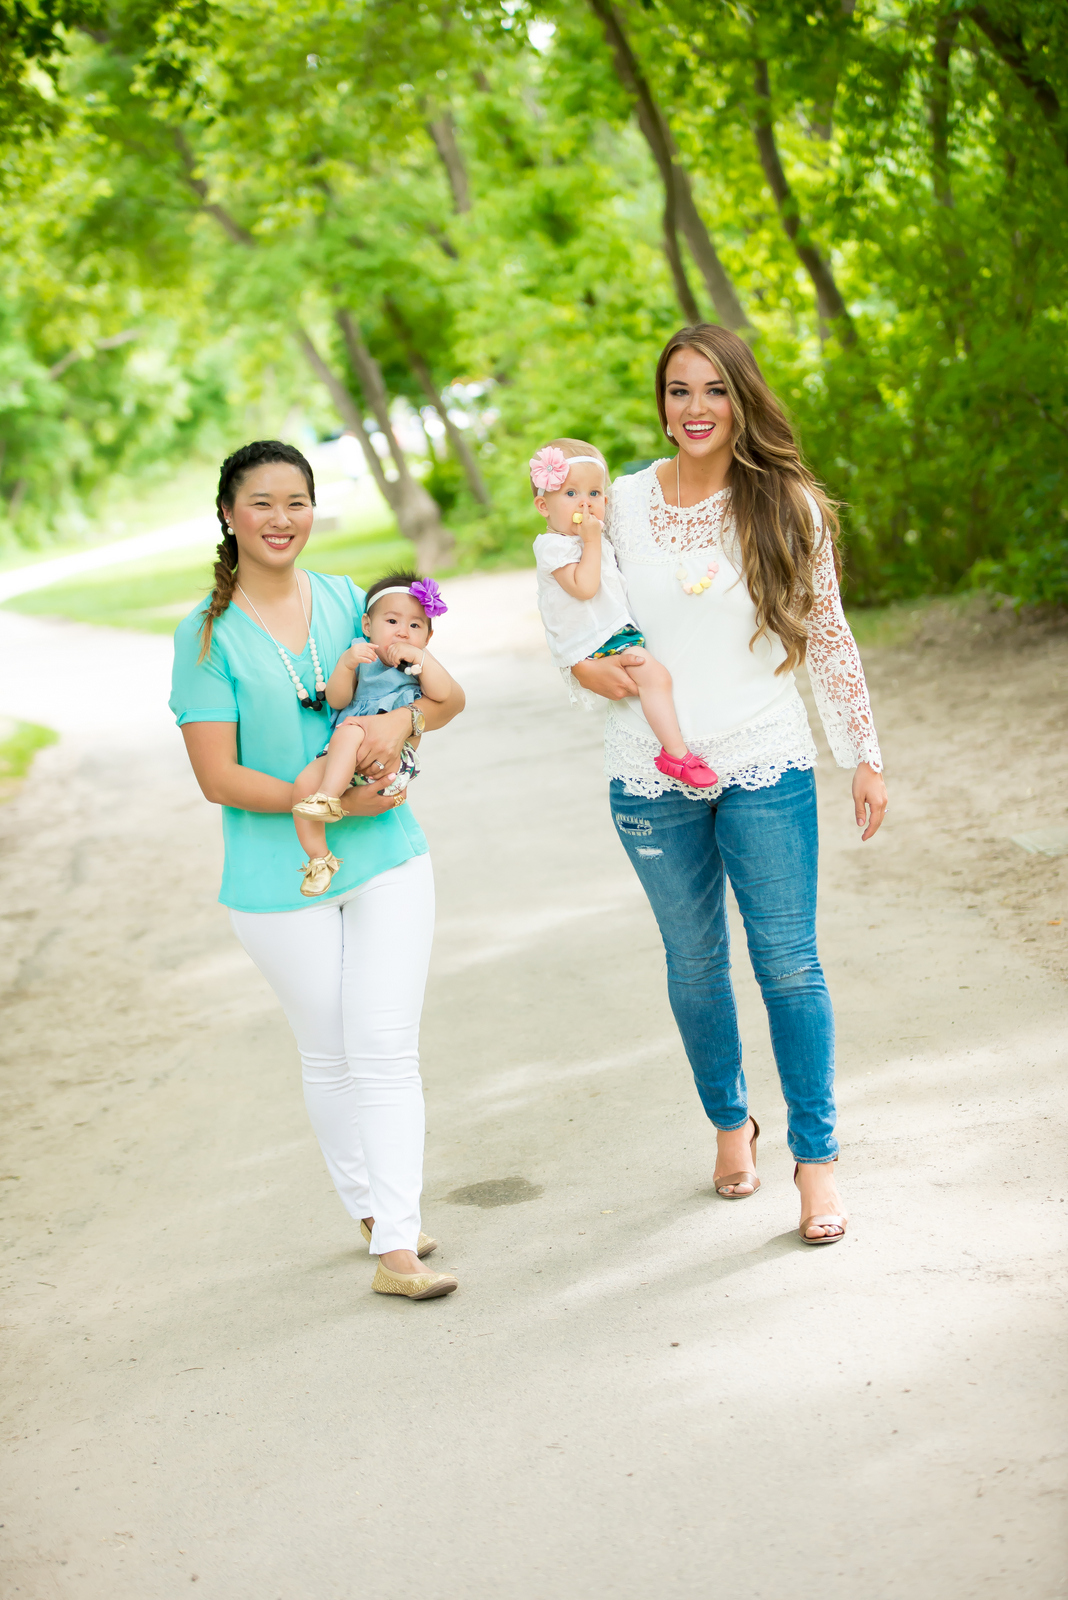 Sandy a la Mode | Mommy + Me Fashion with Bold Beautiful Life